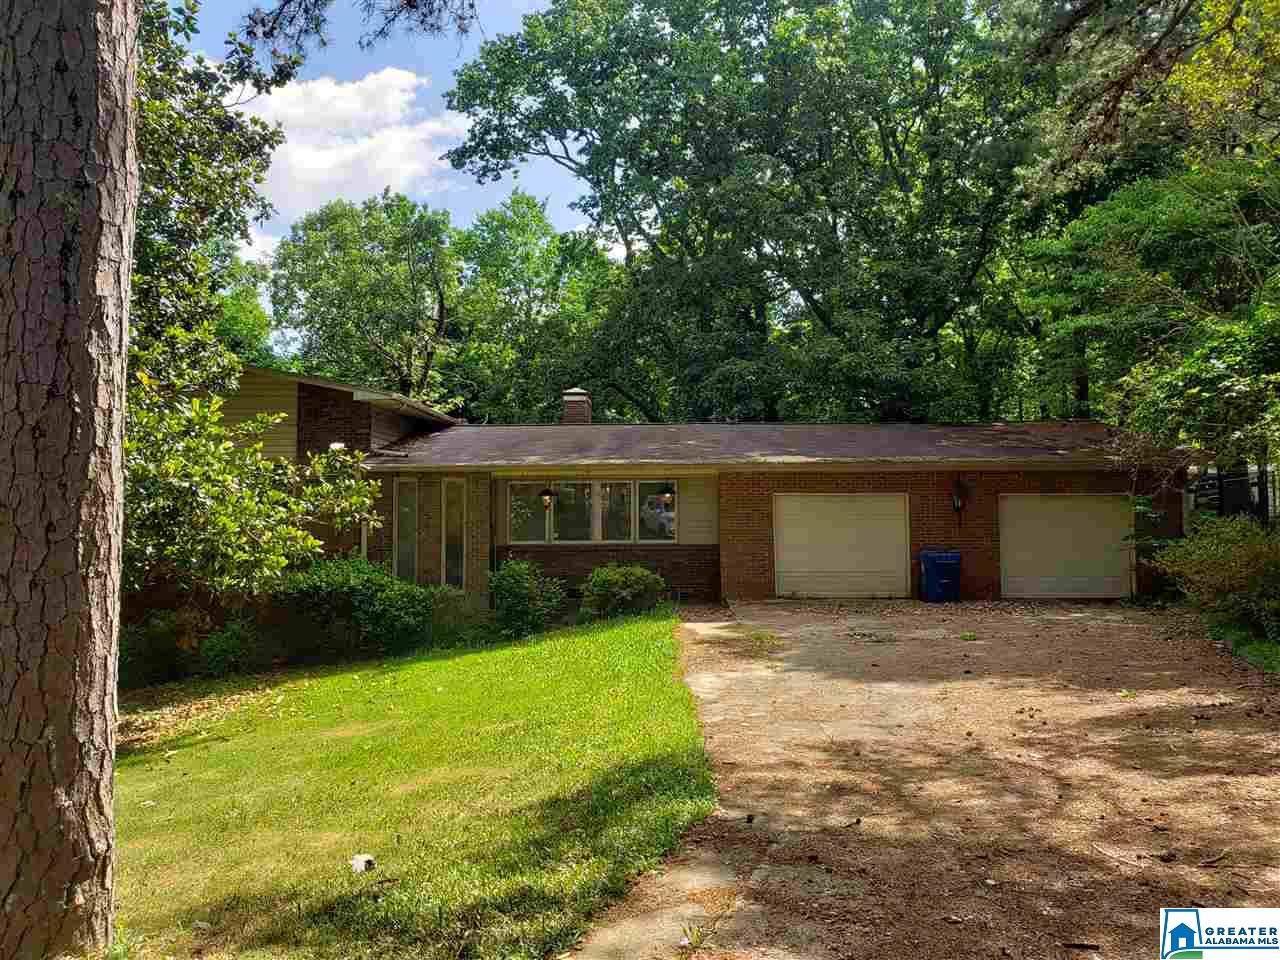 405 Wildwood Rd - Photo 1